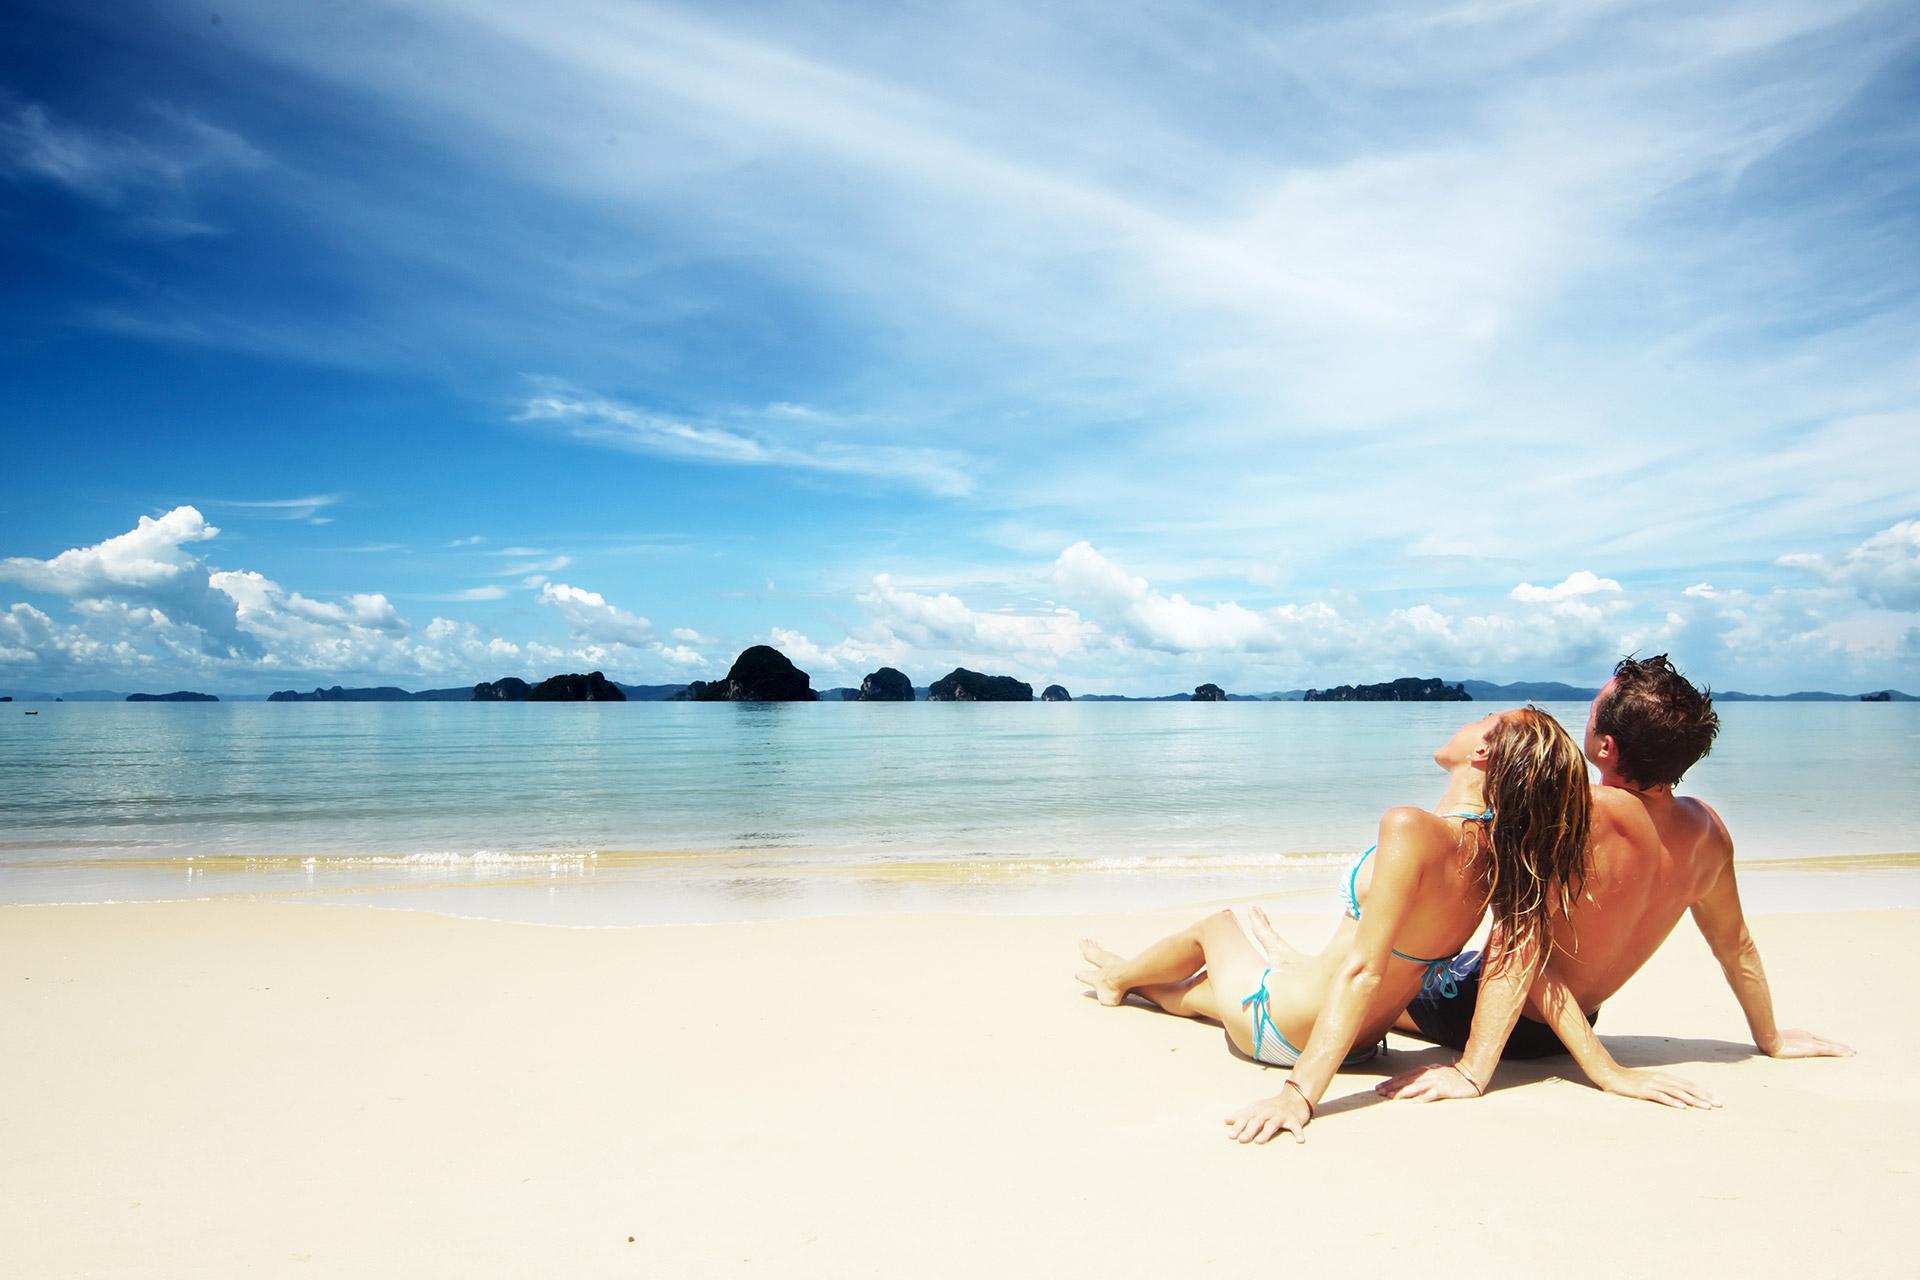 Phuket Tour 1 - Travel agency - Tours & activities in Phuket, Phang Nga, Krabi, Phi Phi islands and Surat Thani.